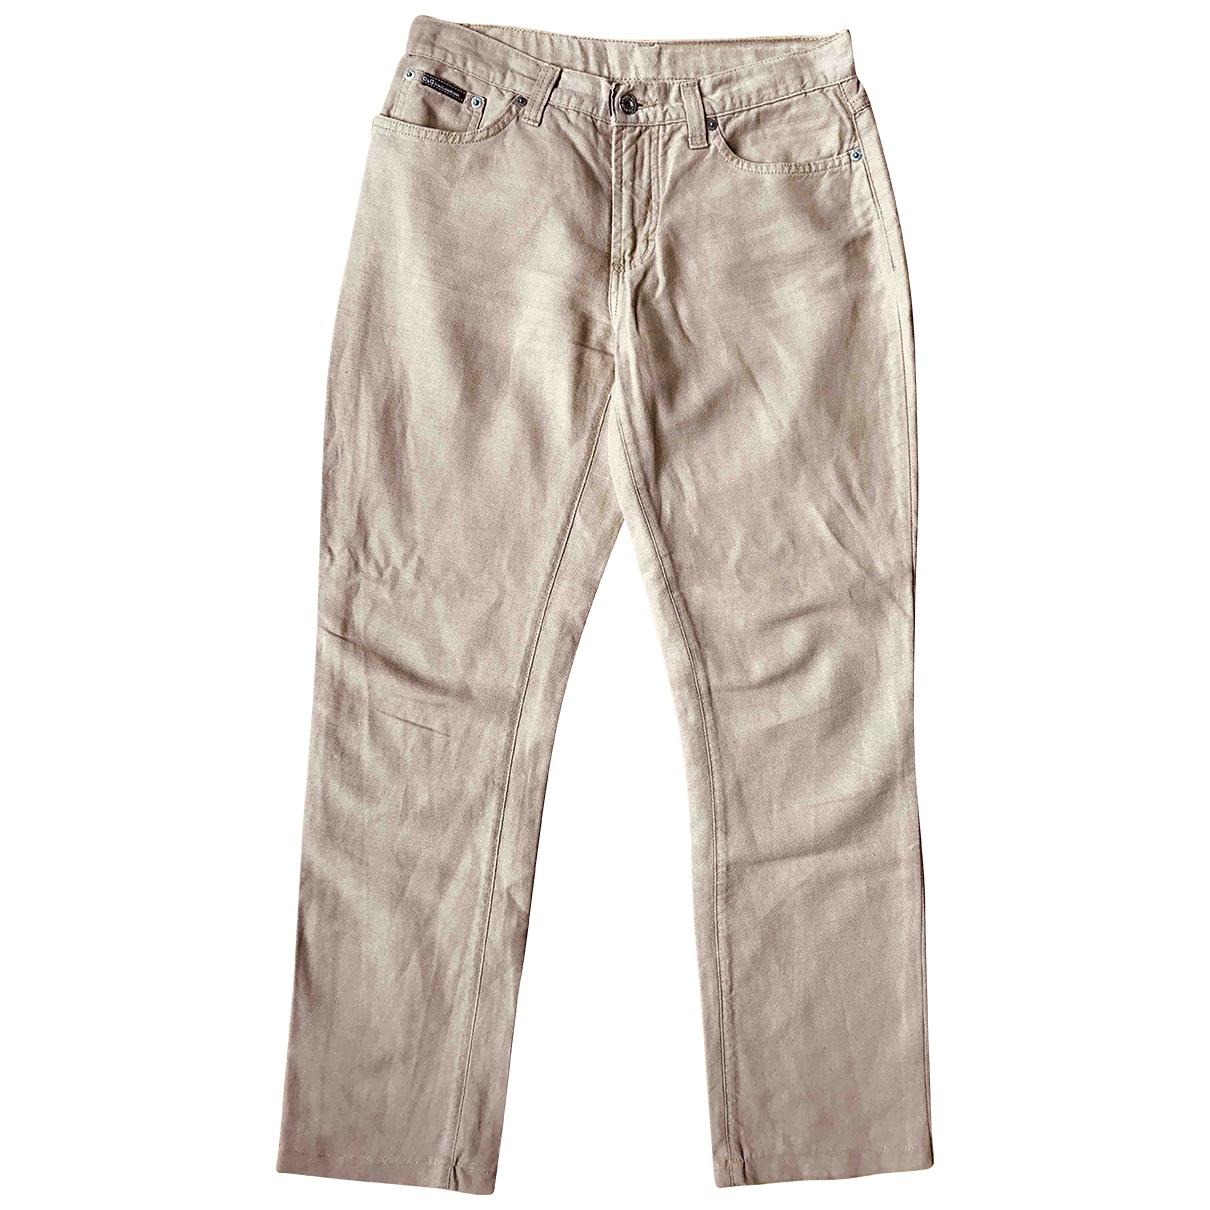 D&g \N Ecru Cotton Jeans for Women 30 US